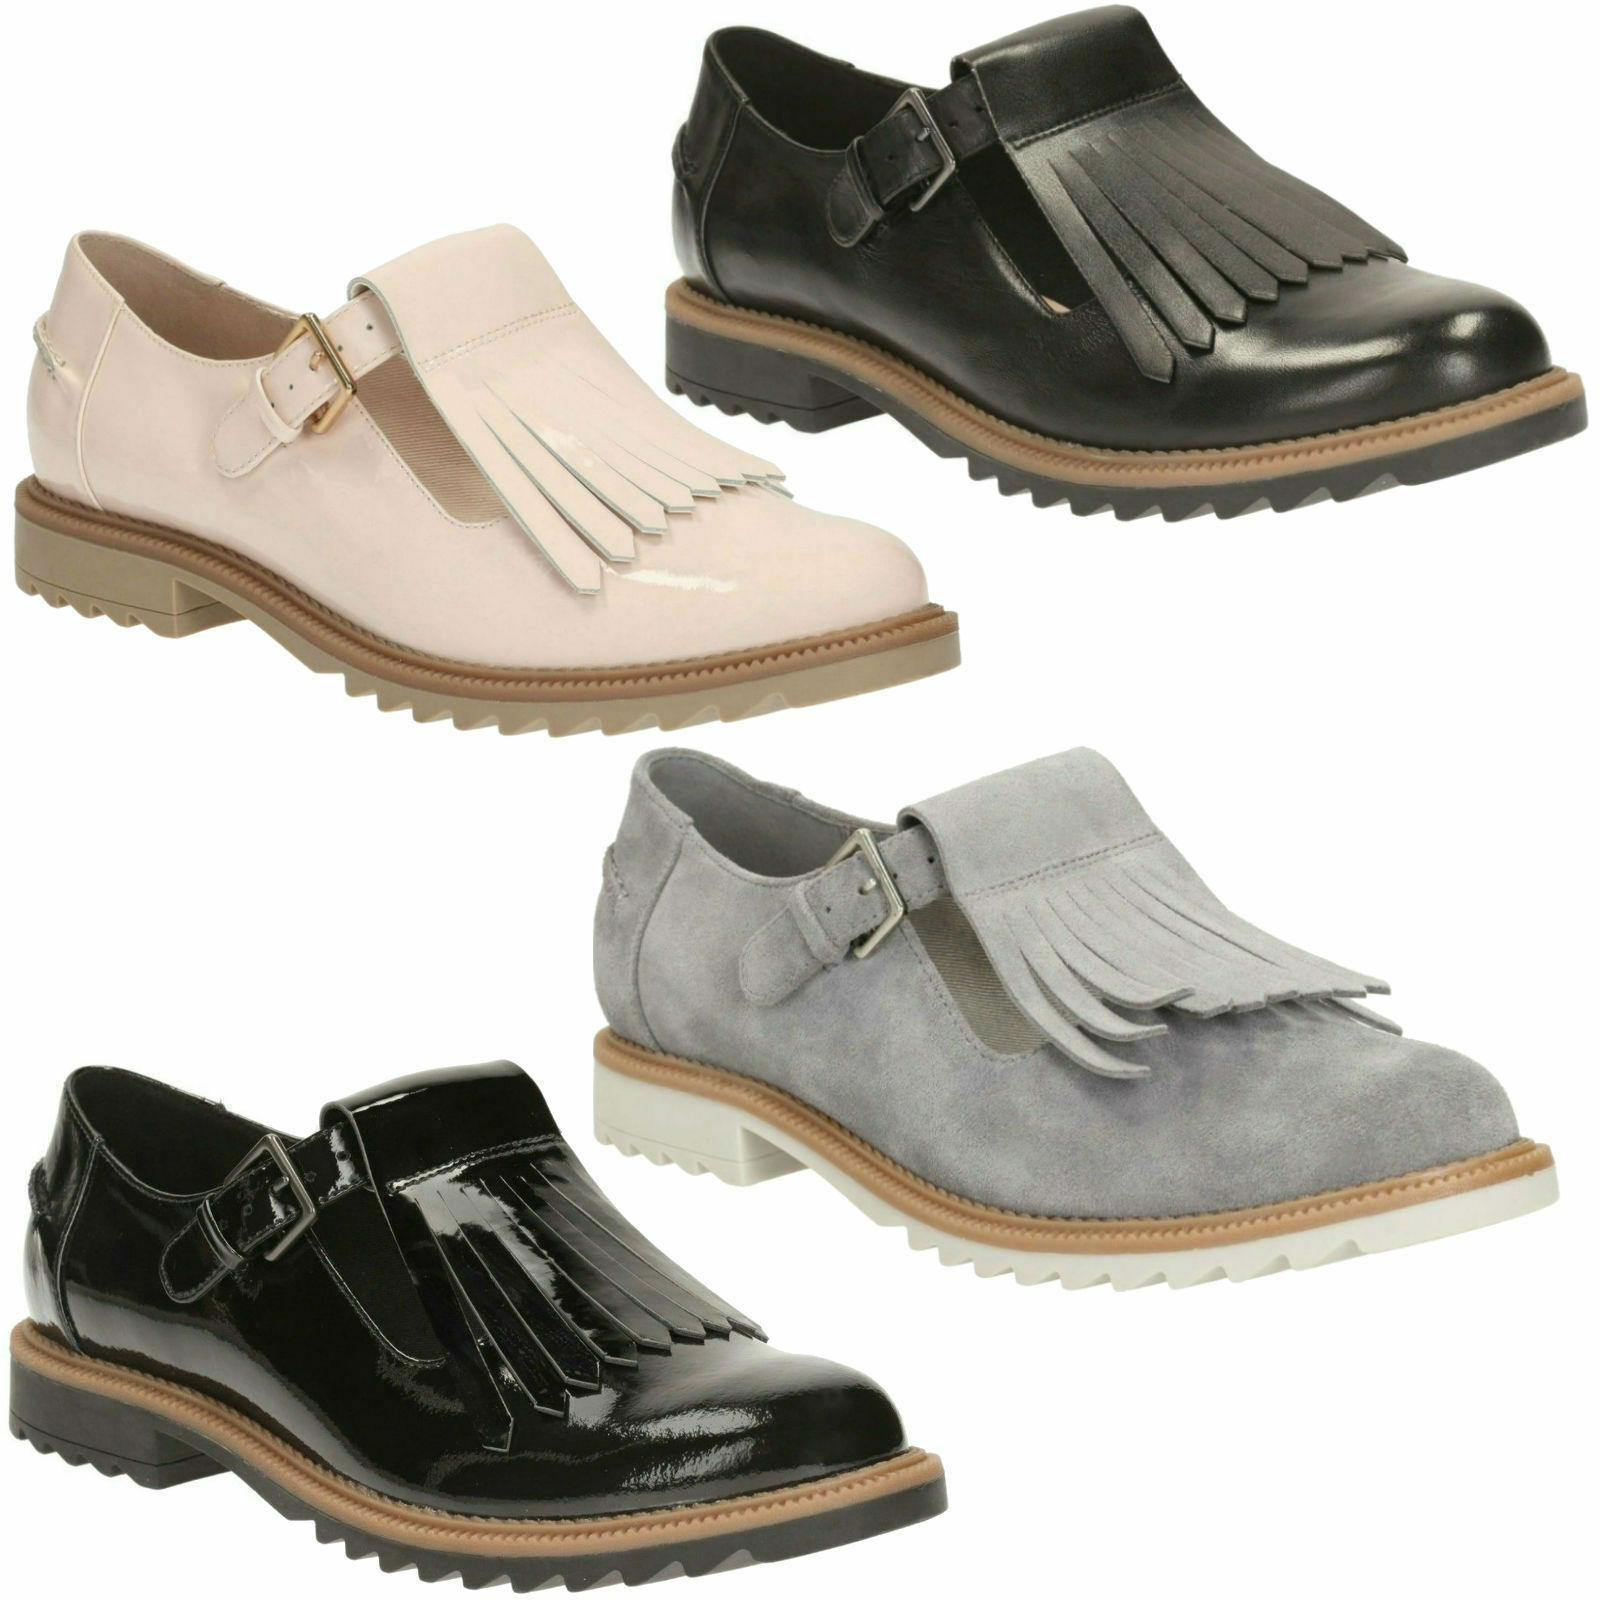 GRIFFIN MIA LADIES CLARKS FRINGE DETAIL BUCKLE Schuhe FASTEN WORK FLAT CASUAL Schuhe BUCKLE a8a59e